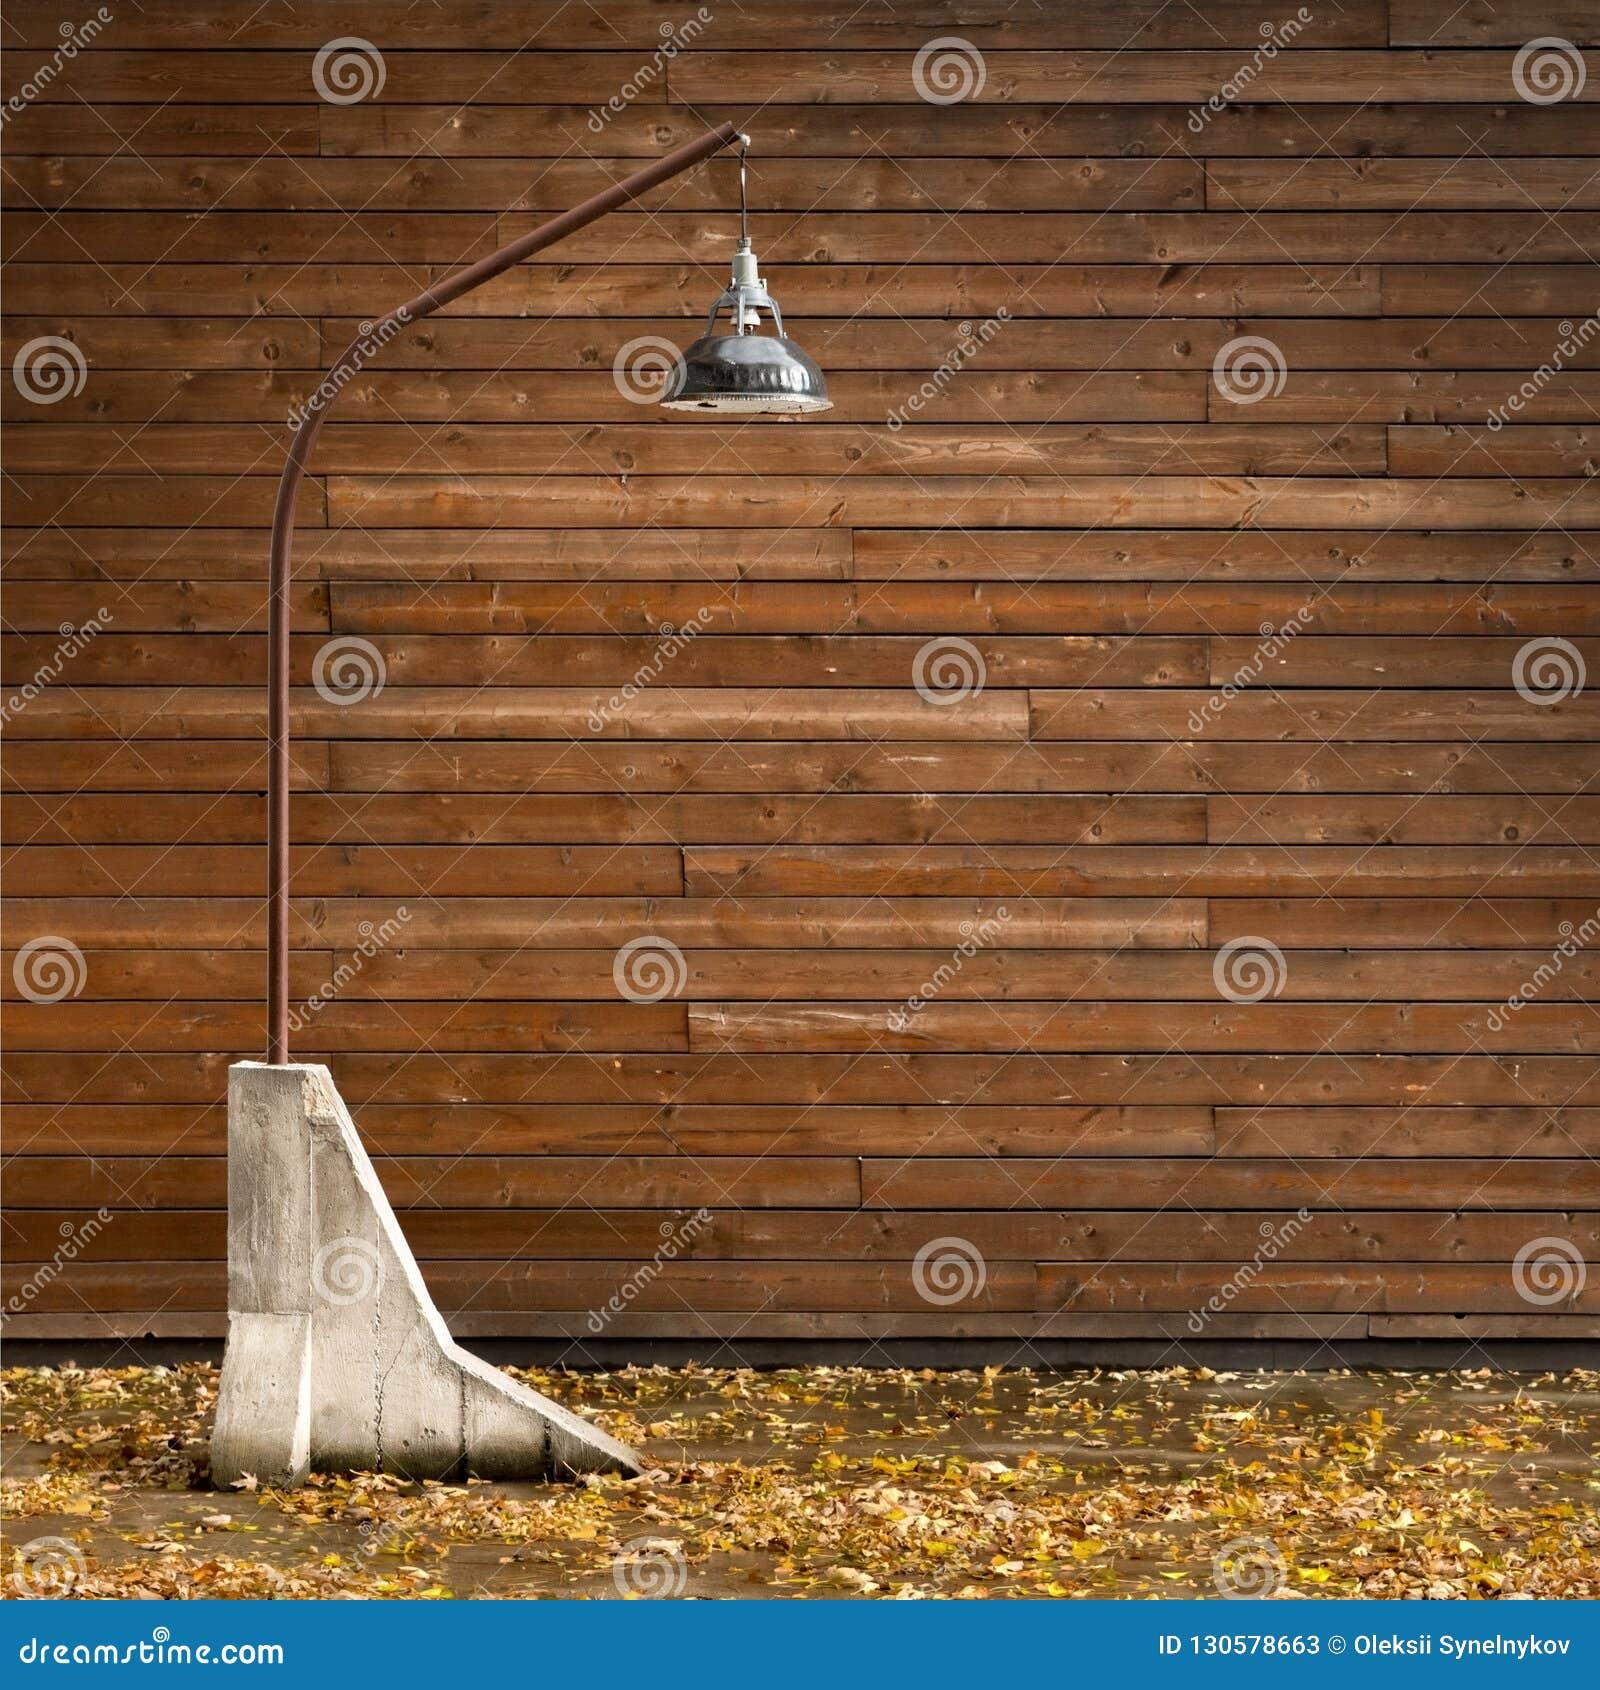 Modern Outdoor Lighting Concept Warm Lighting Melanholic Stock Image Image Of Grey Floor 130578663